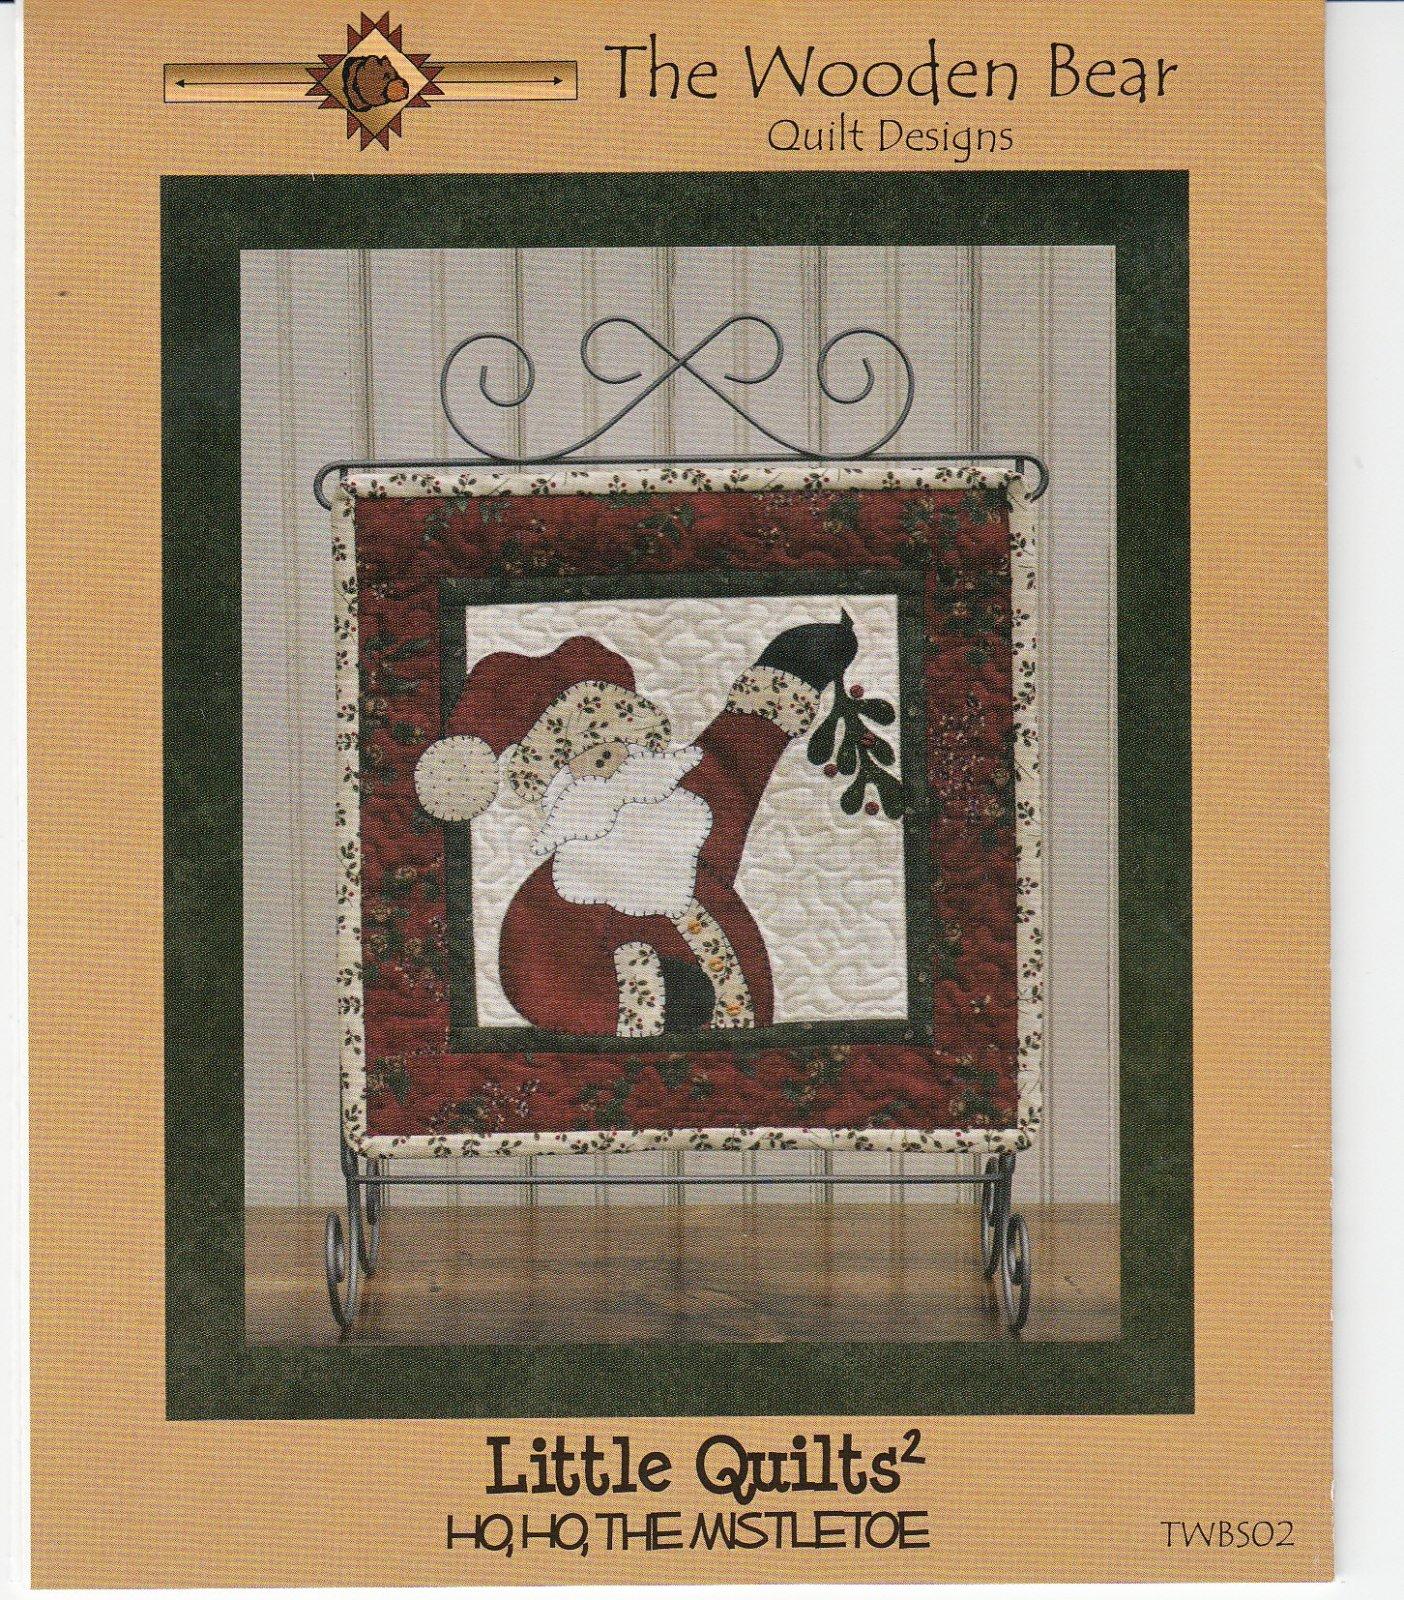 Little Quilts Squared Ho Ho The Mistletoe - December